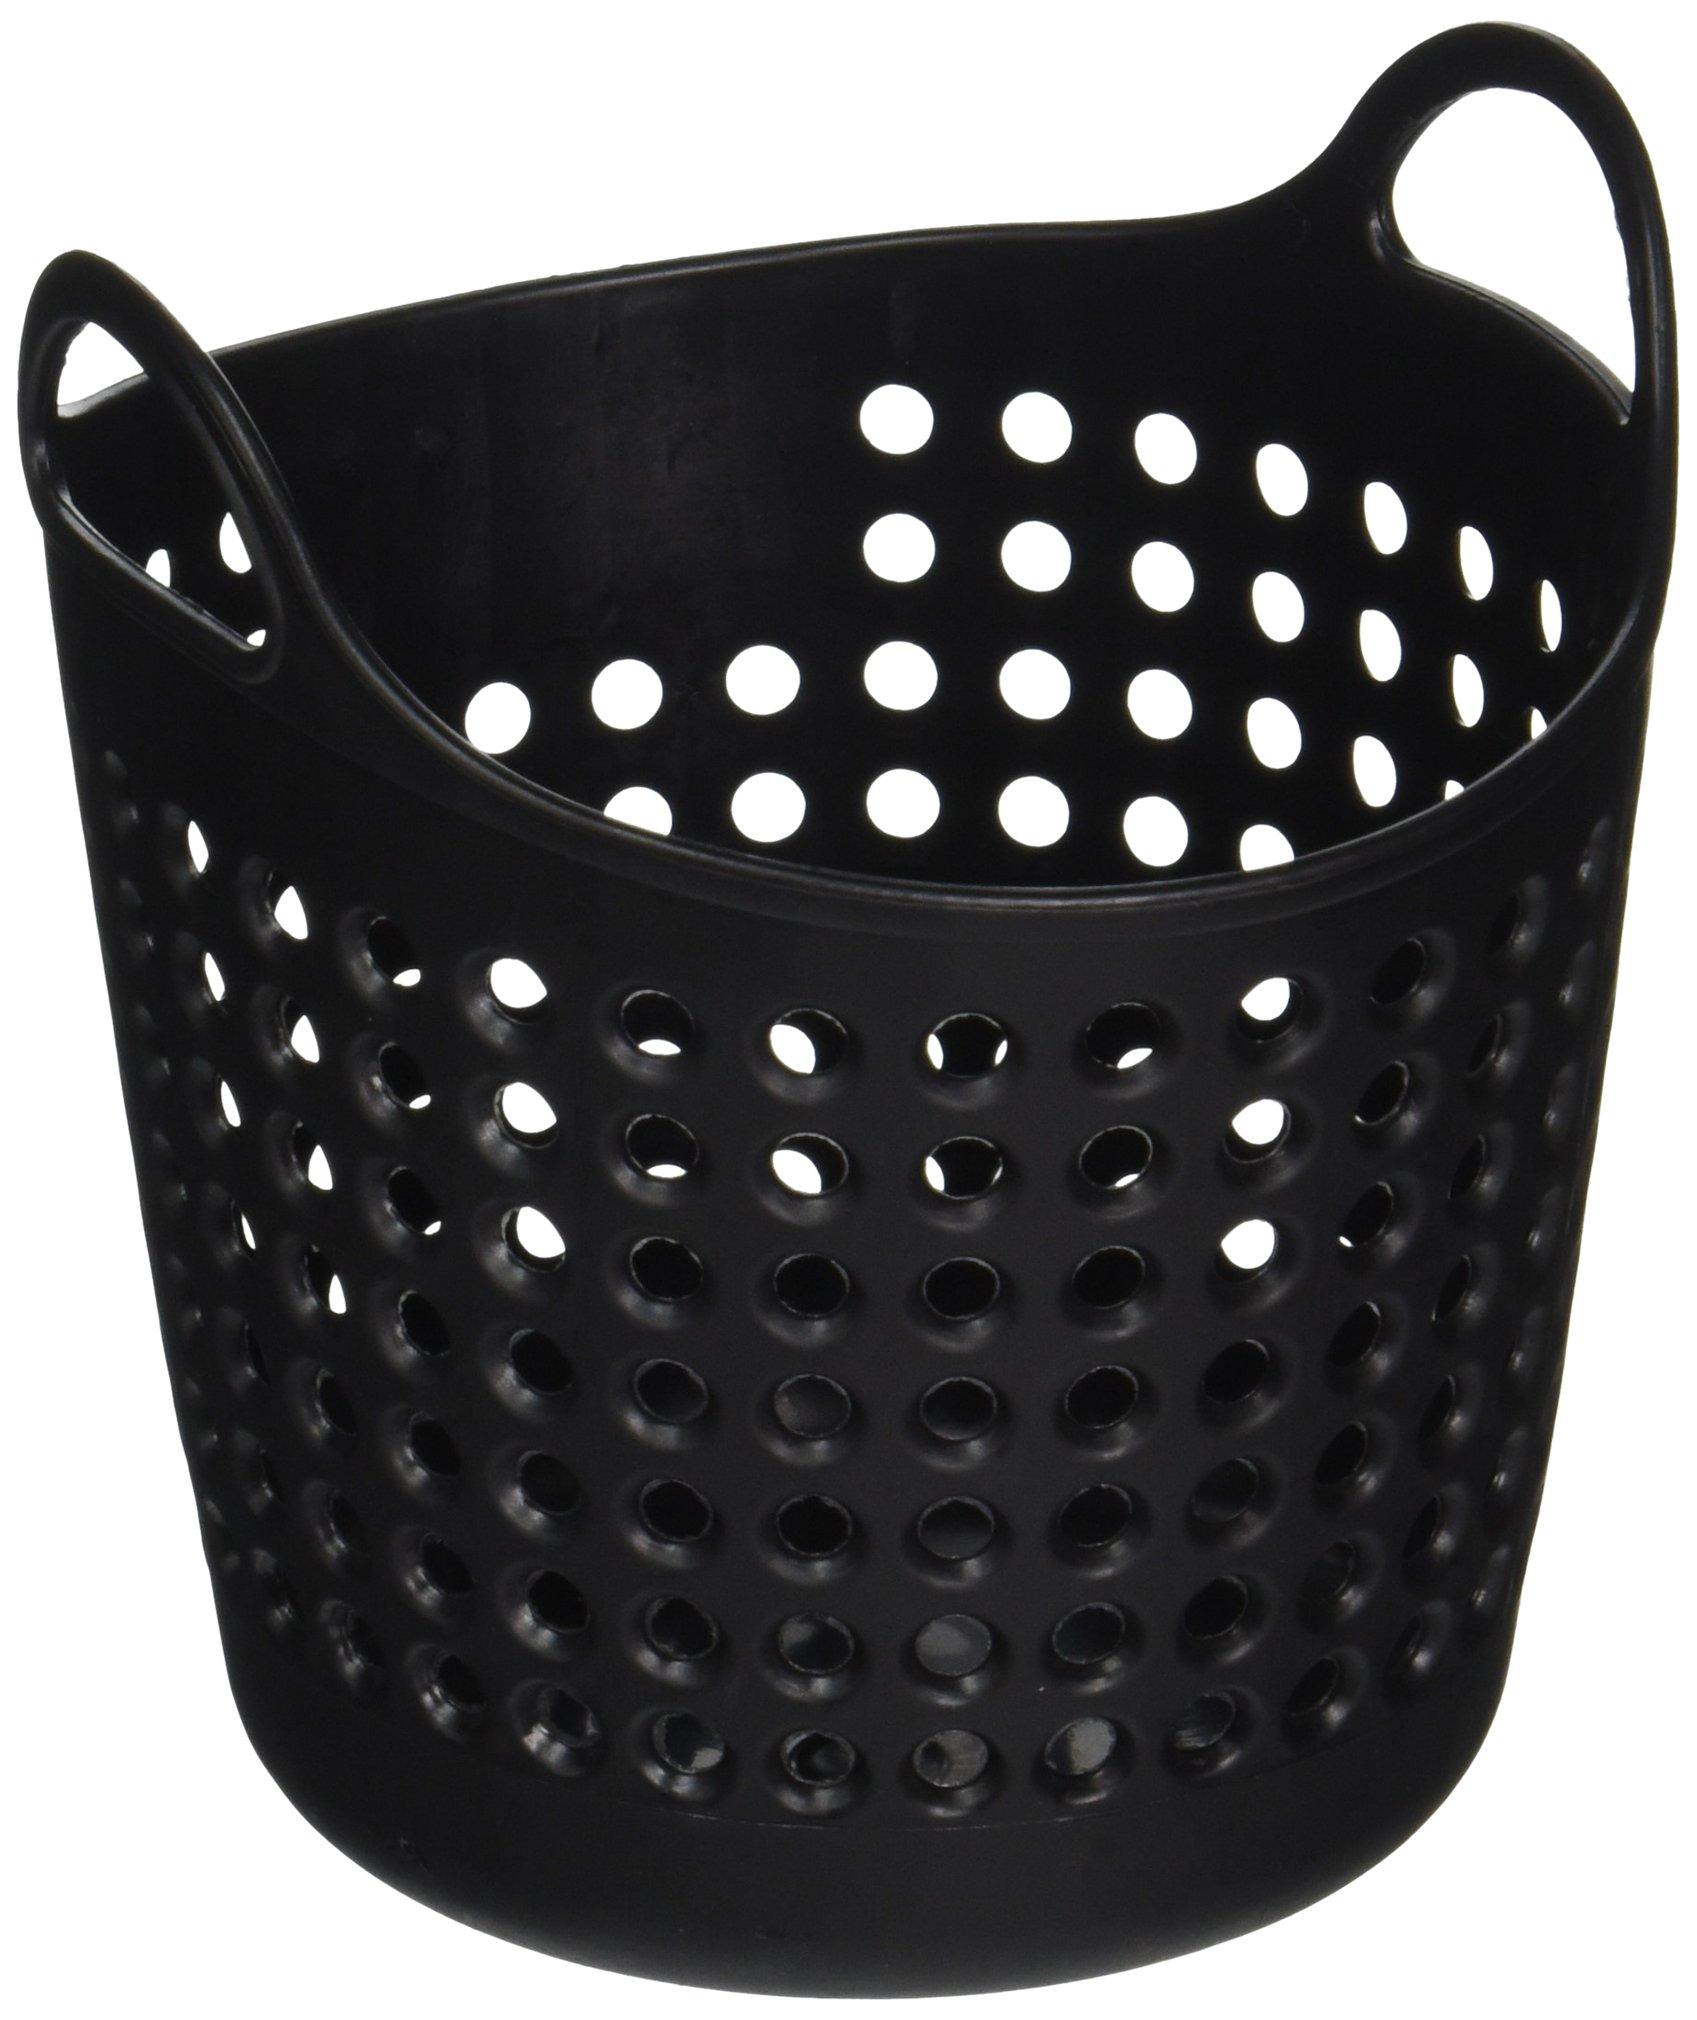 StealStreet SS-KD-1616-BLACK Mini Laundry Basket Office Supply Organizer, 4.25'', Black